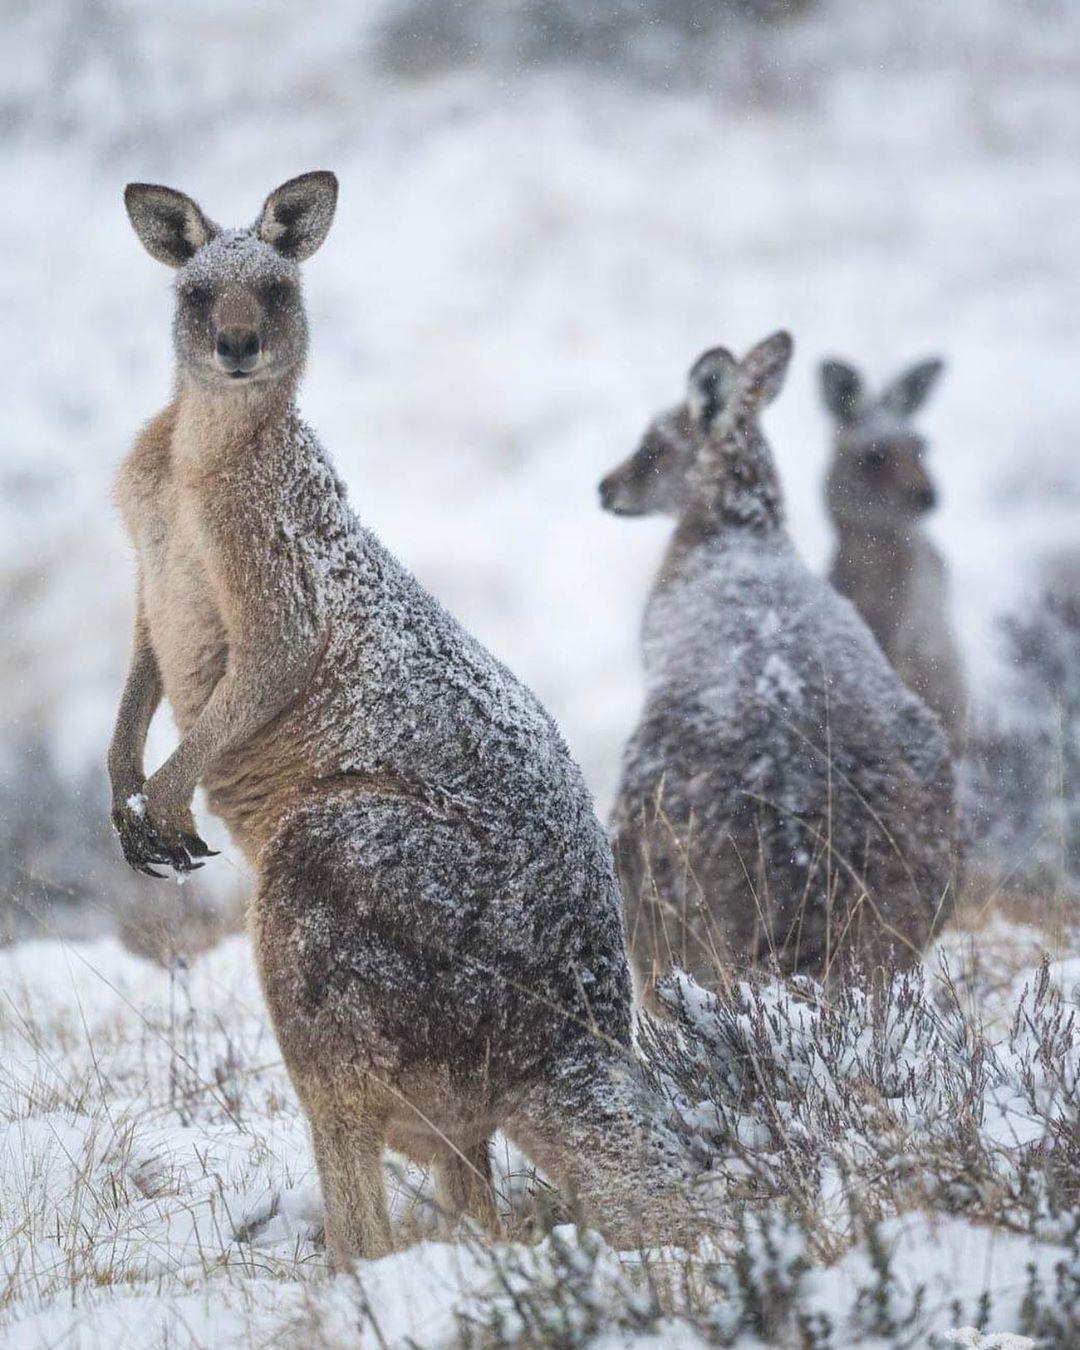 Kangaroo's in the snow